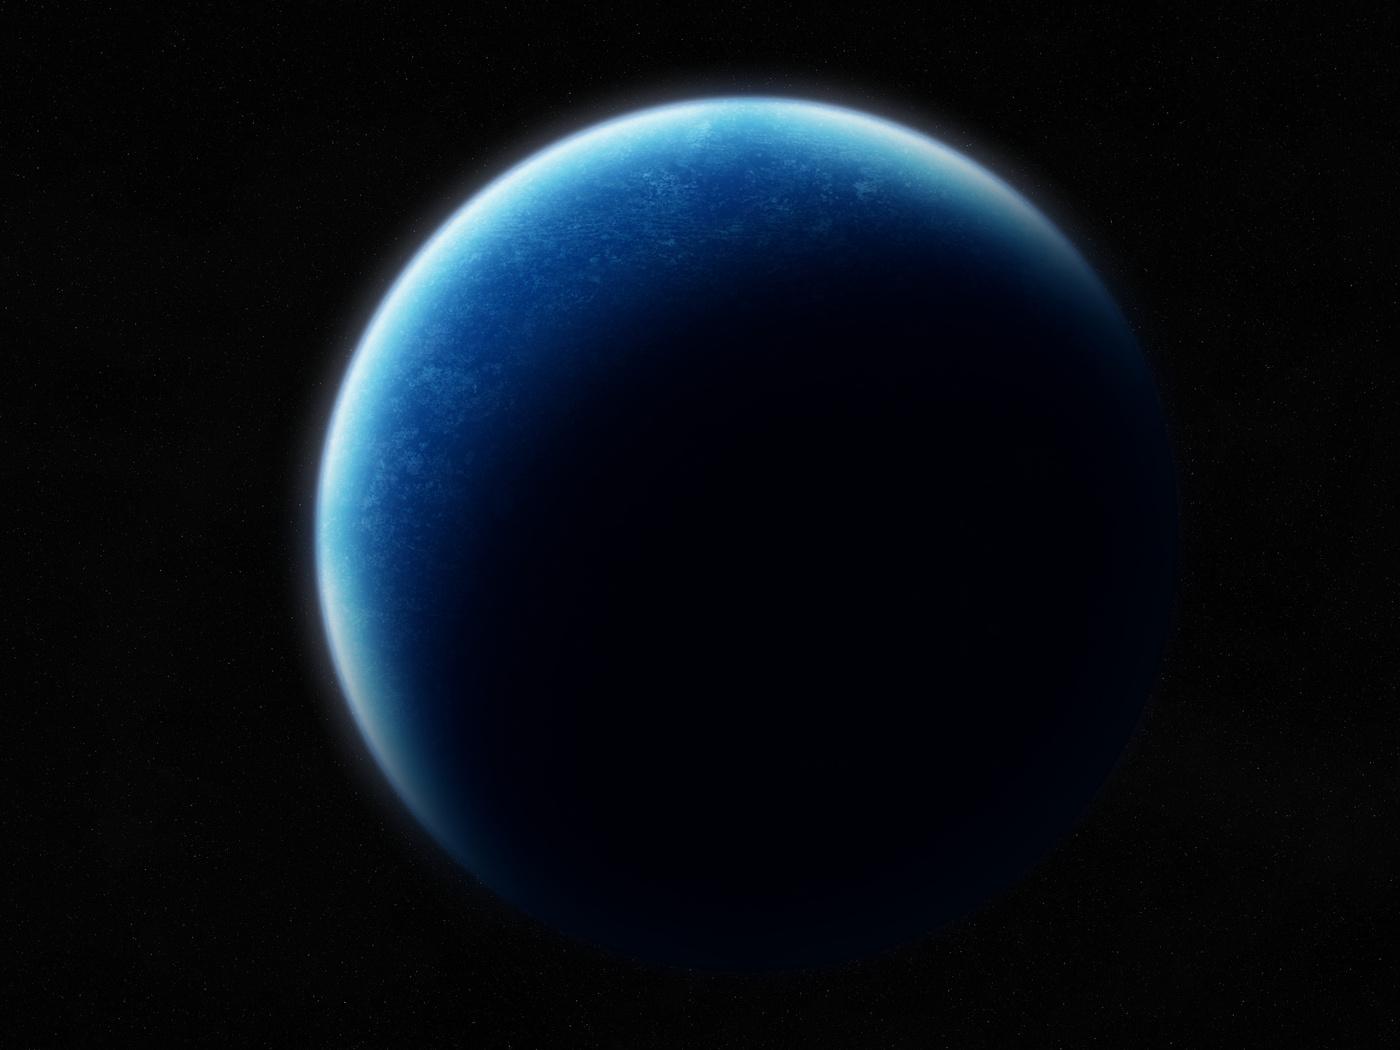 Sci fi, planet, blue, shadows, black